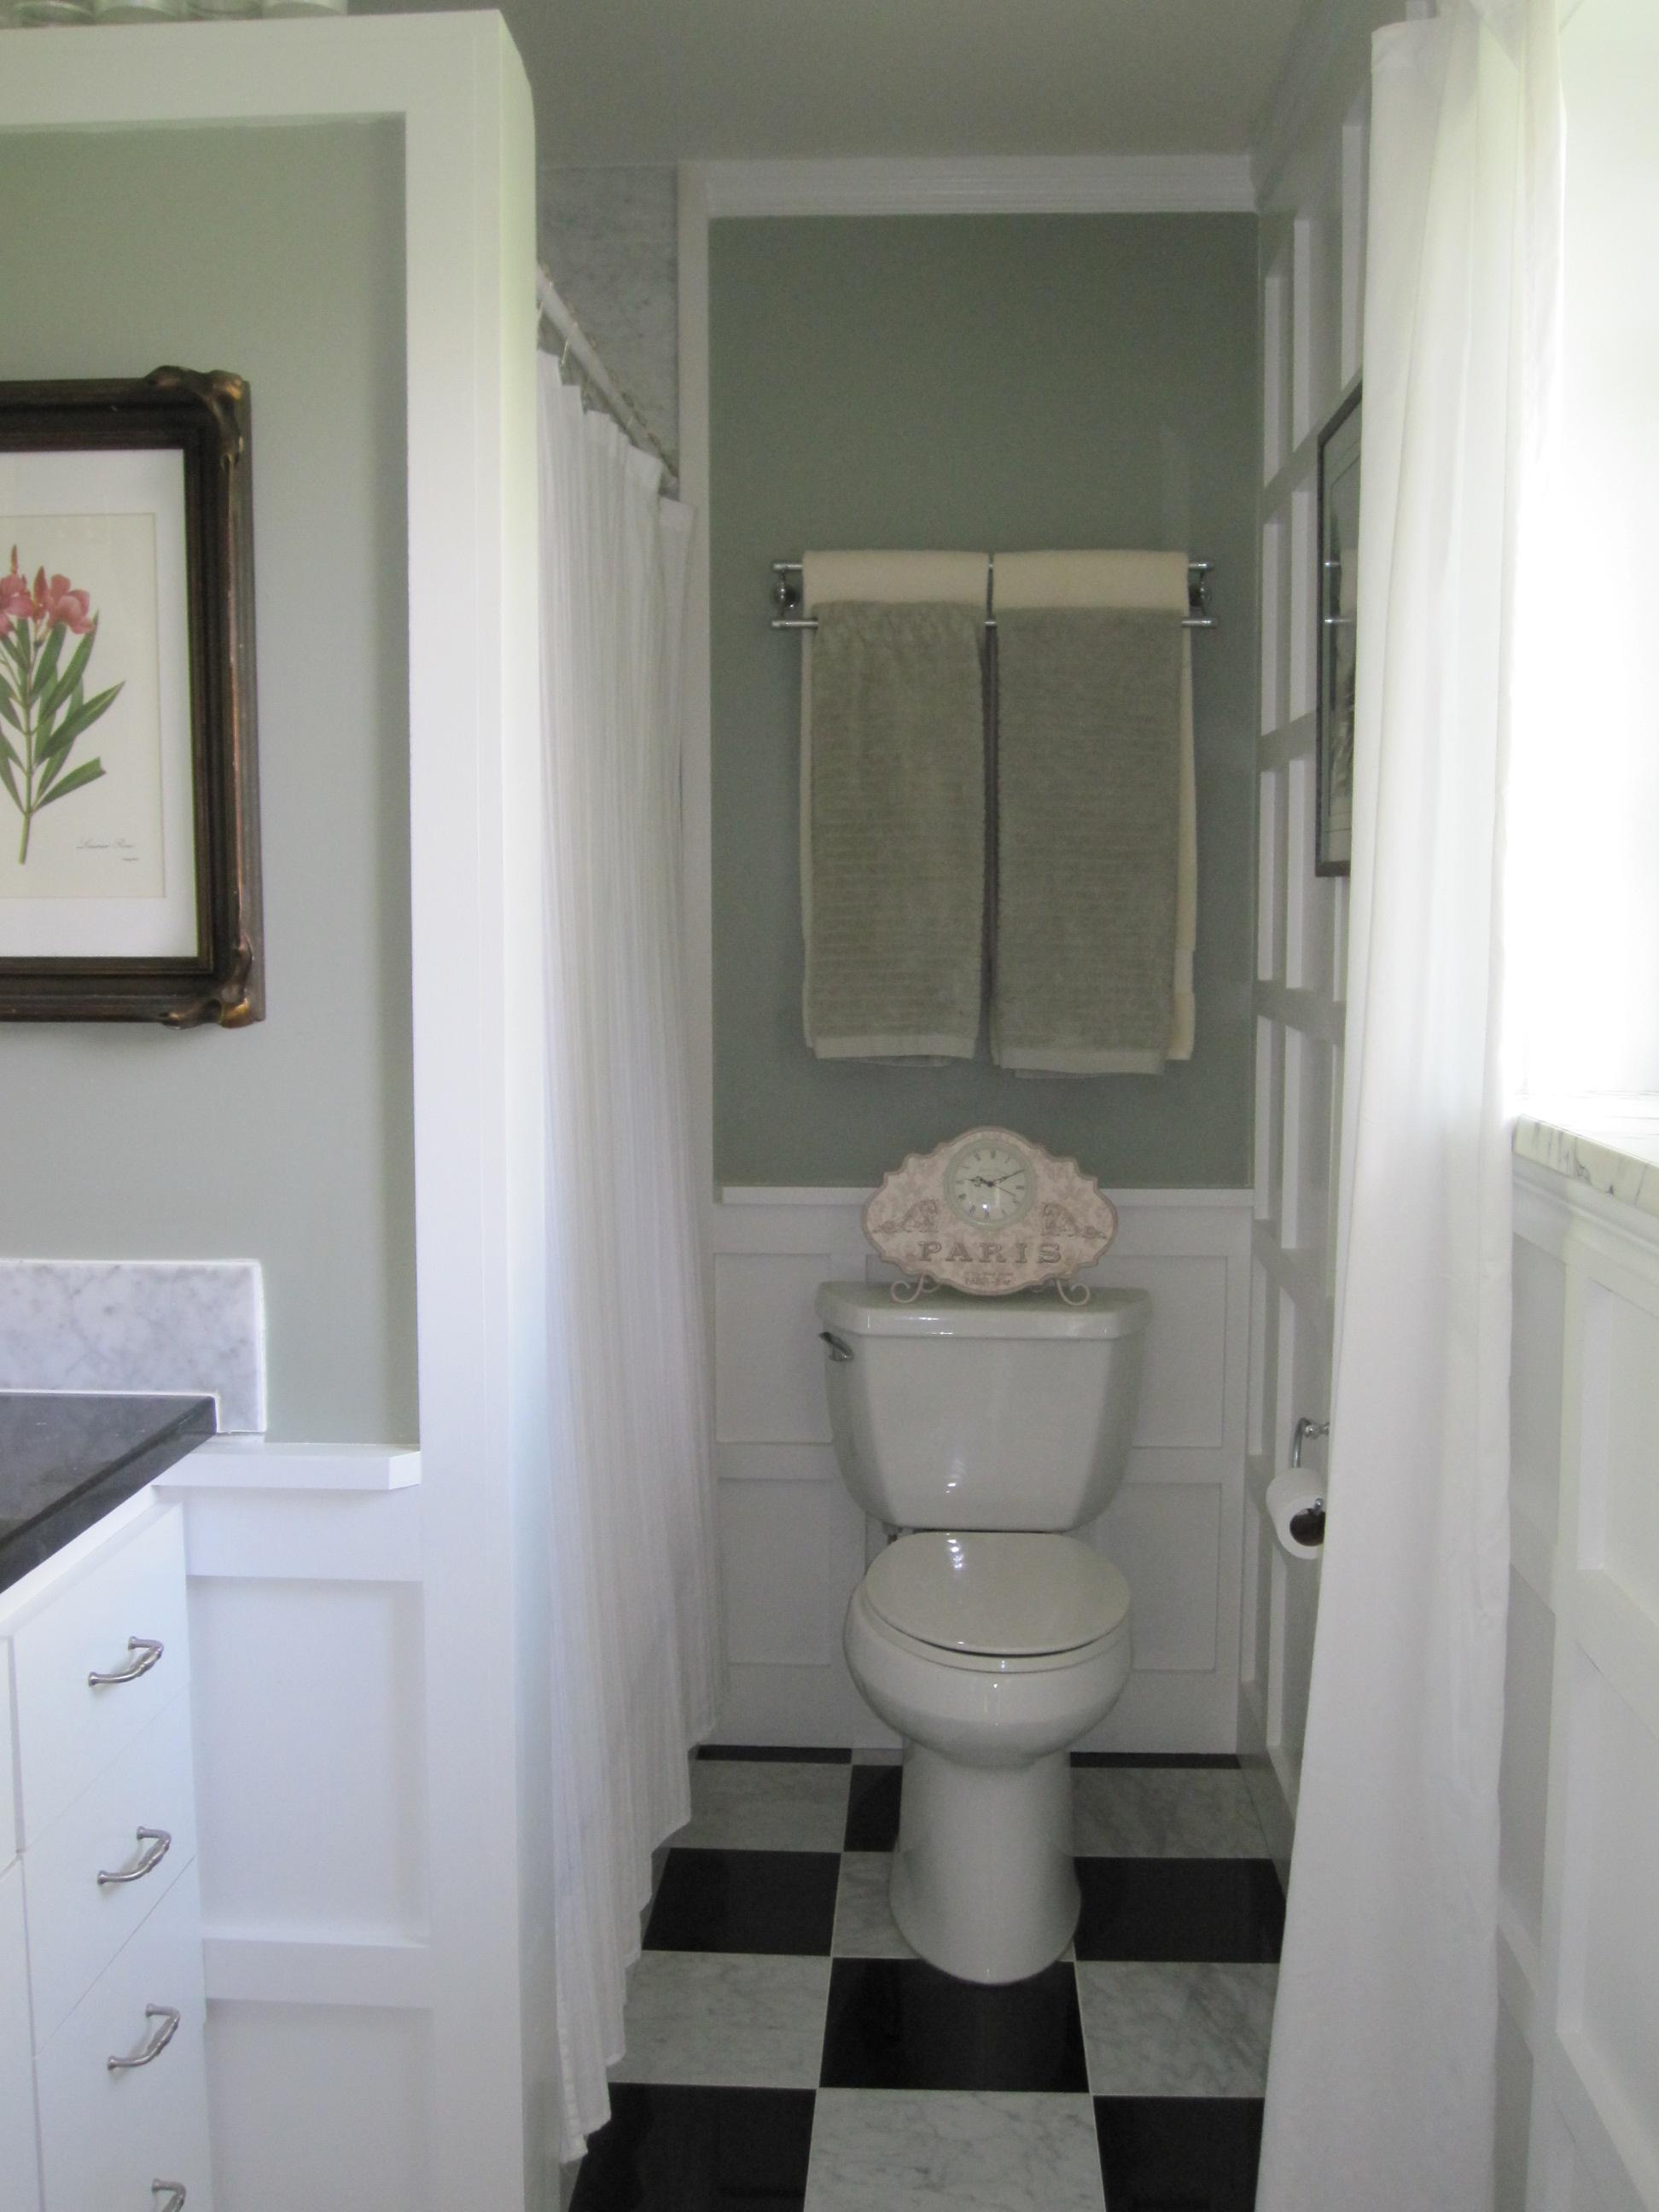 behr yellow bathroom paint colors apps directories. Black Bedroom Furniture Sets. Home Design Ideas